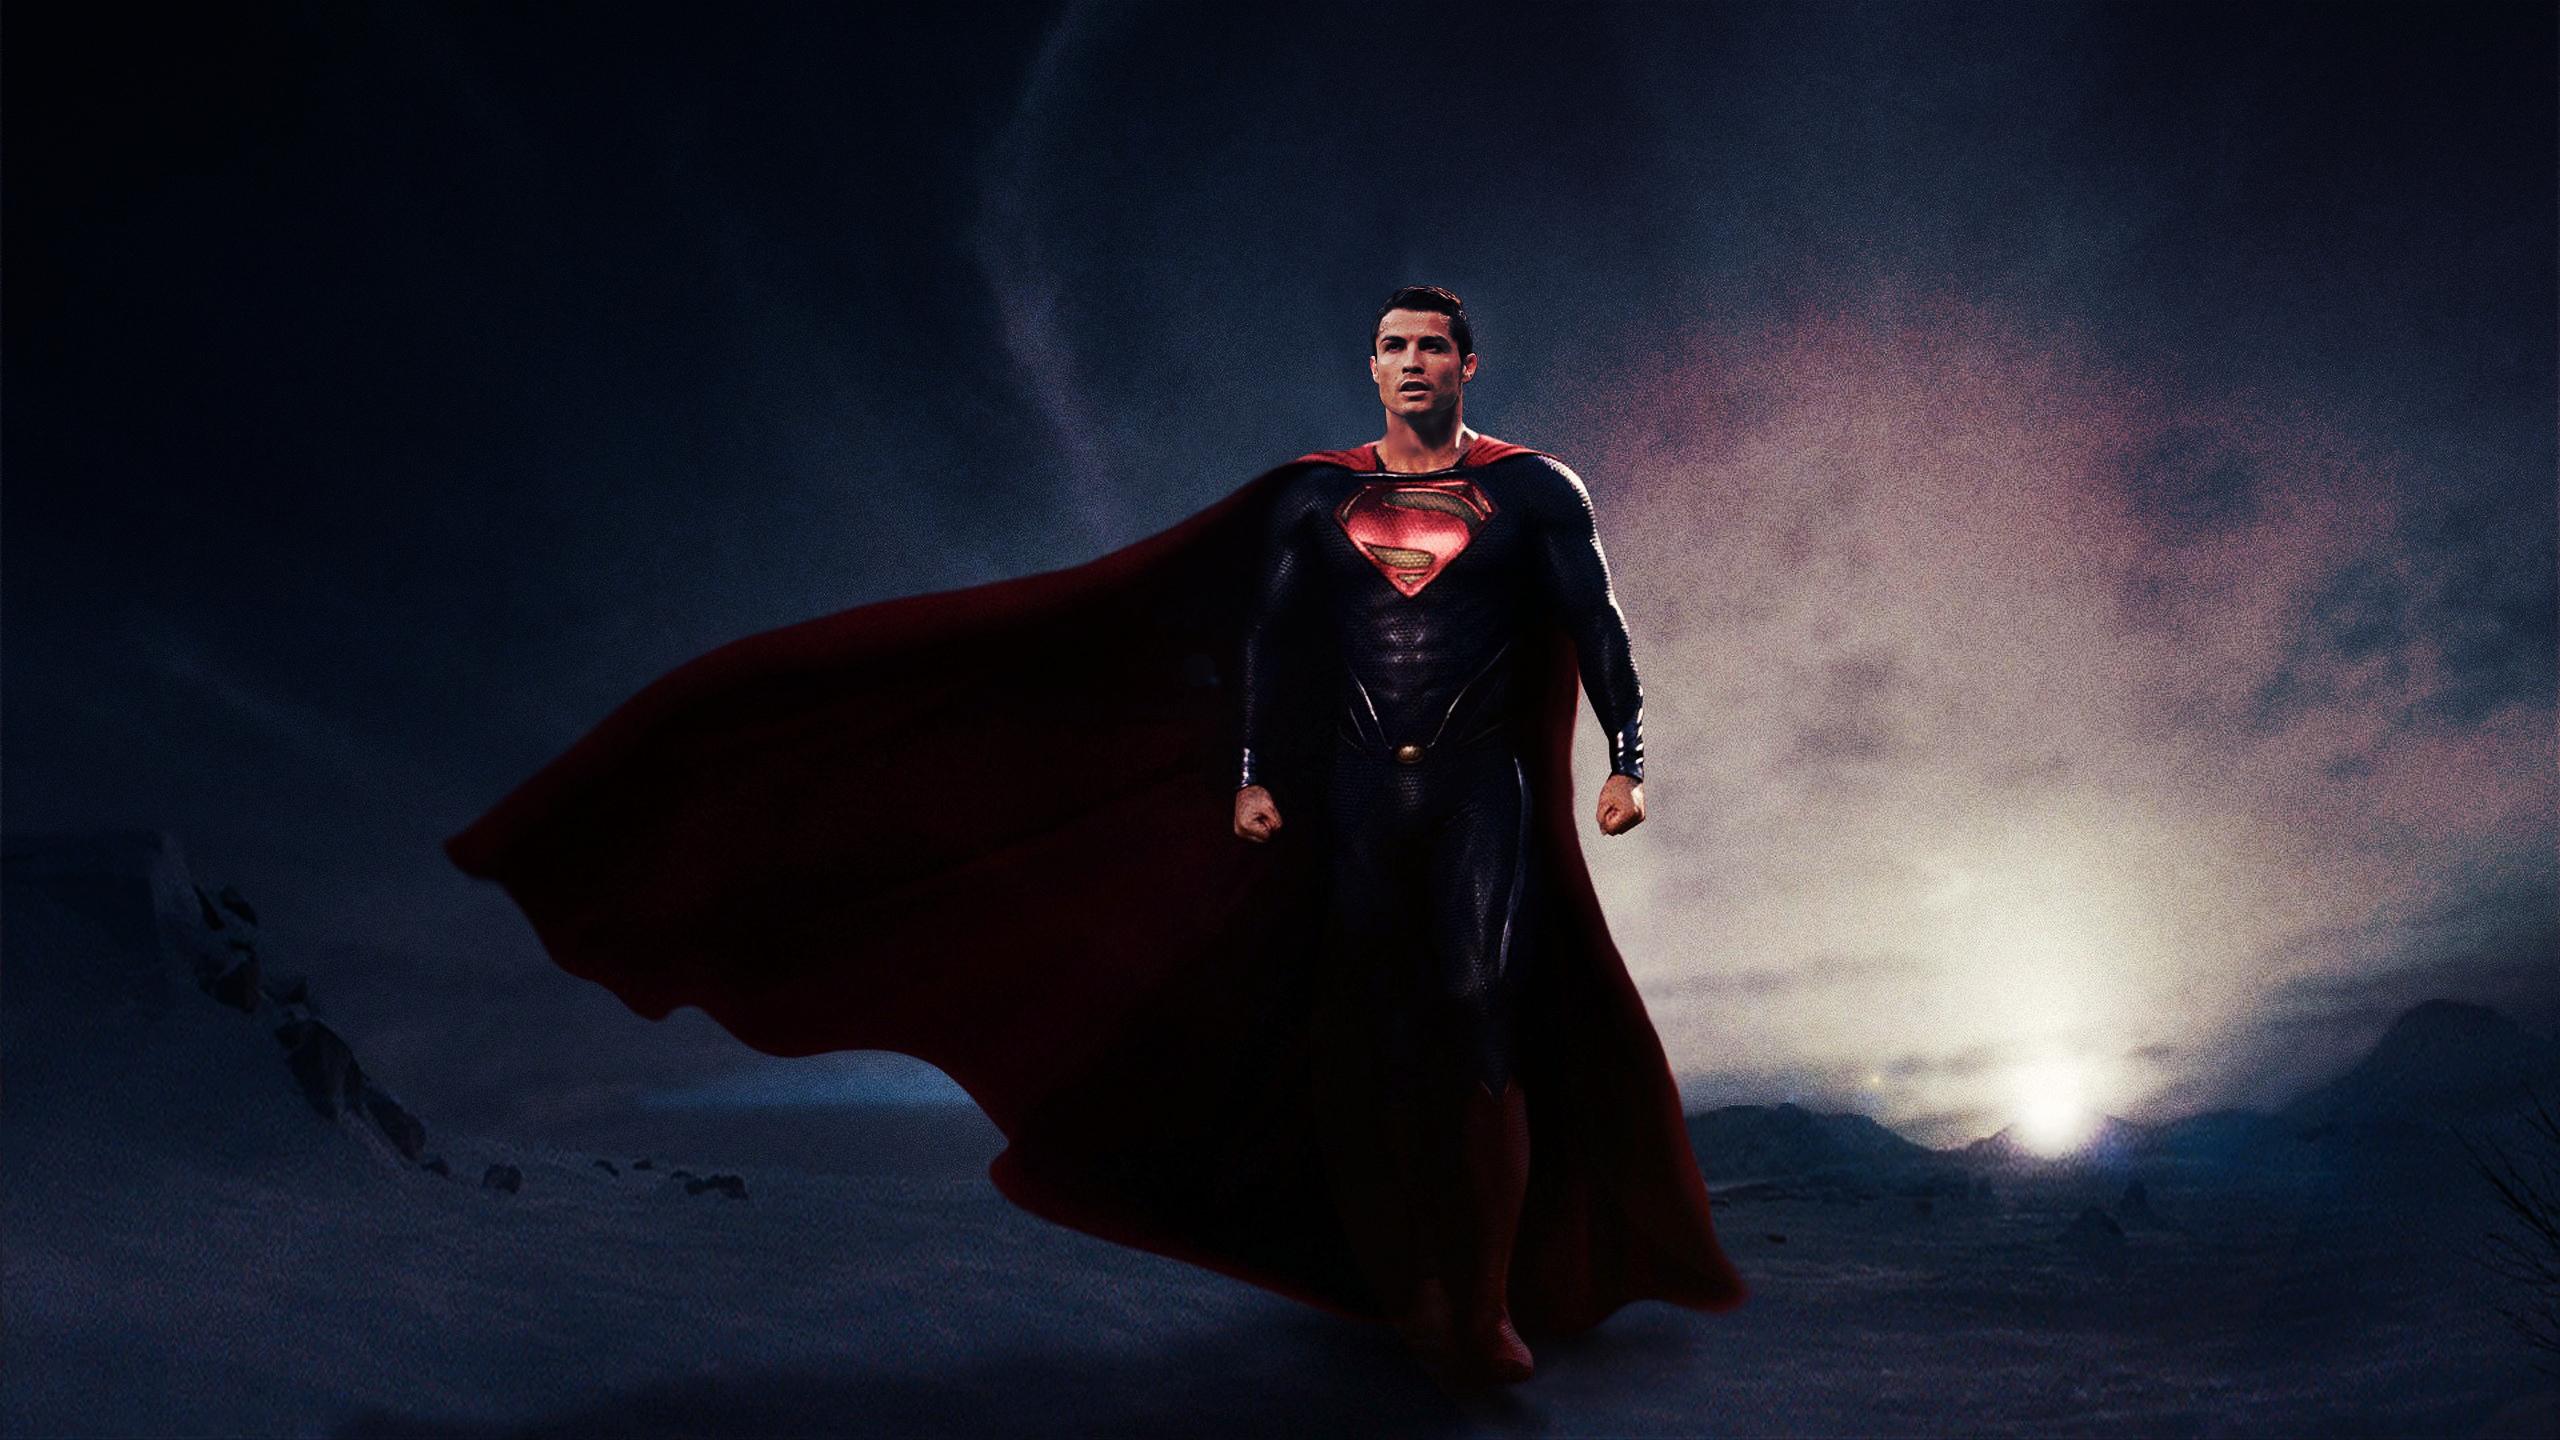 Cristiano Ronaldo : Man of Steel CR7 by MemedaliLimani on ...